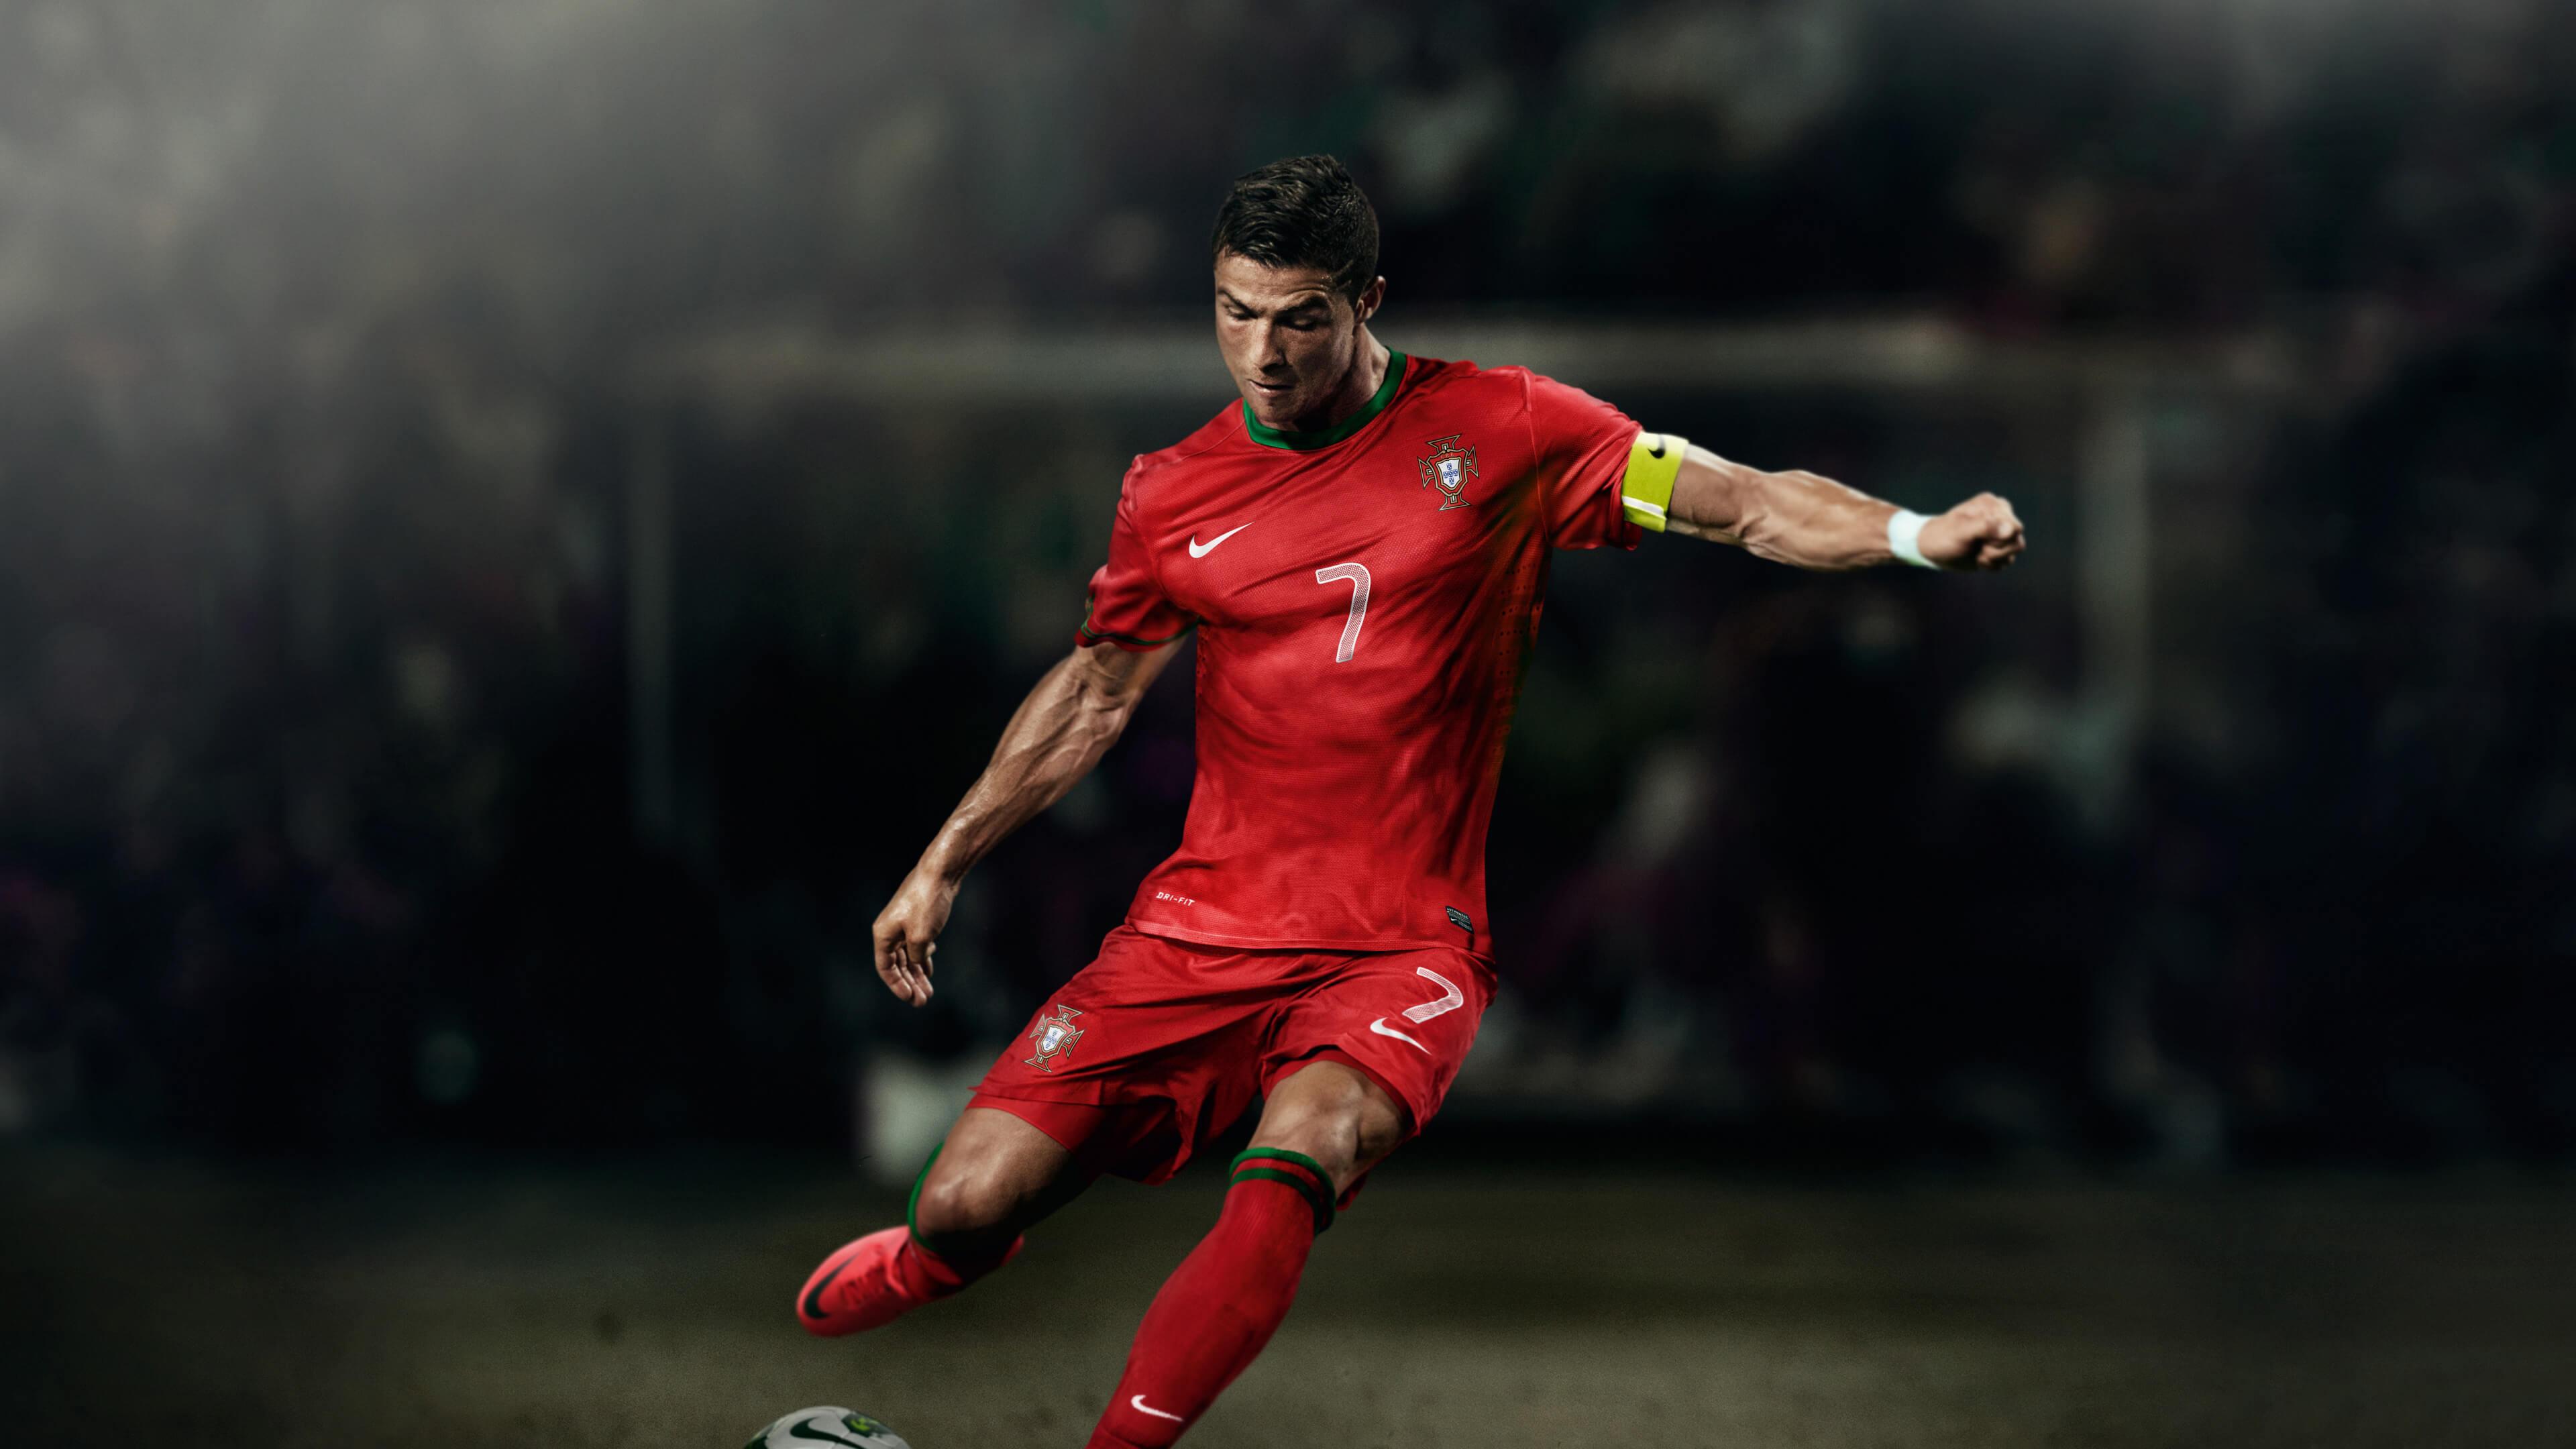 Cristiano Ronaldo Ps4wallpaperscom